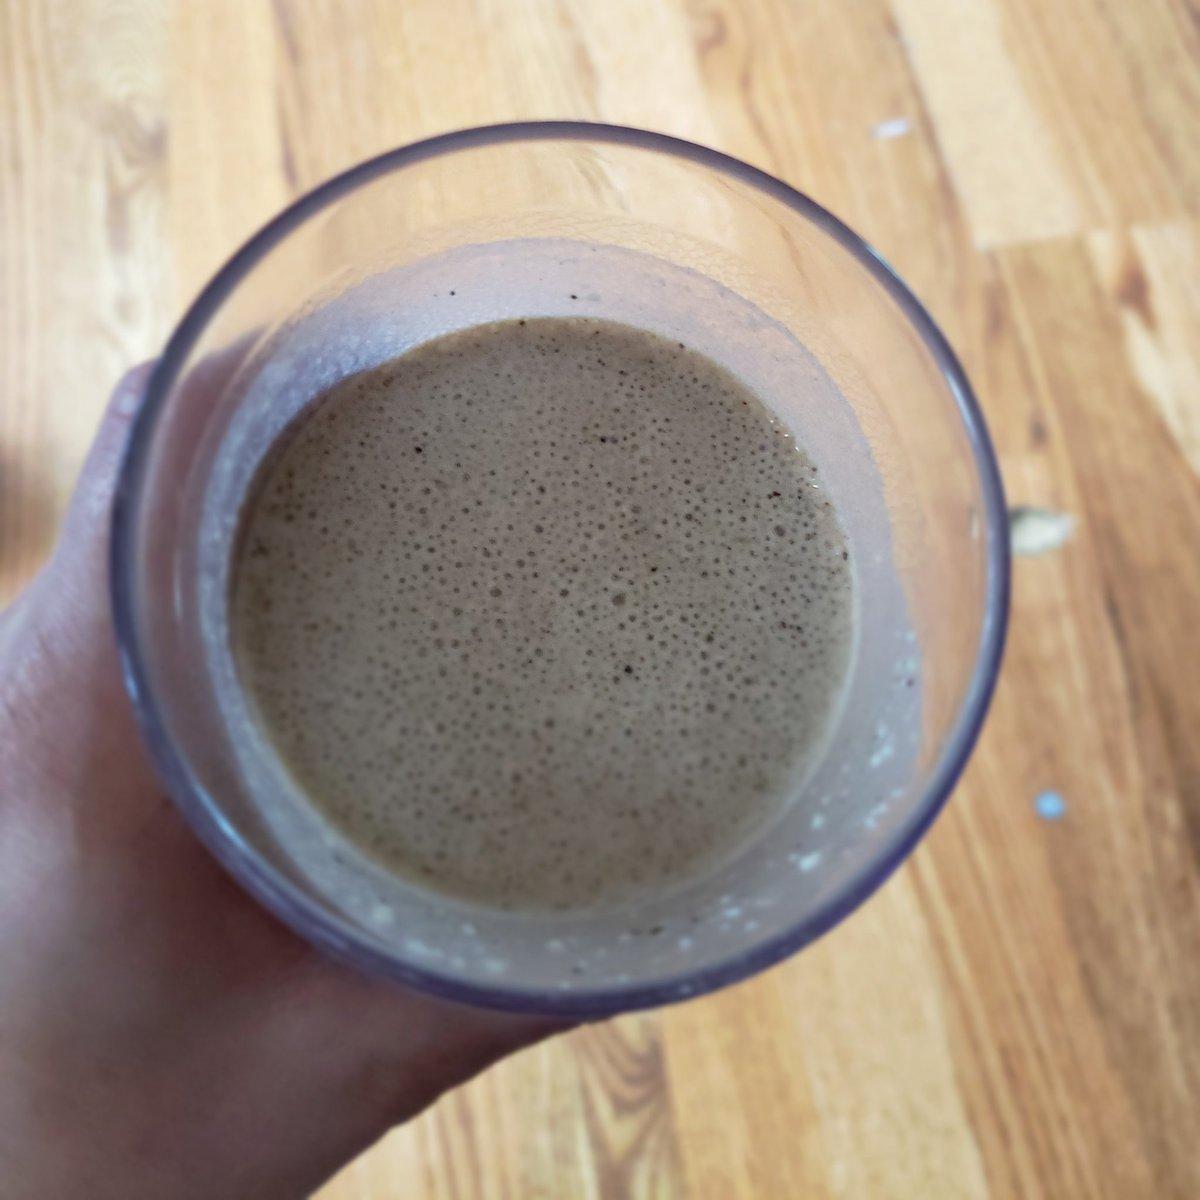 test Twitter Media - Favorite smoothie so far #vegaoneprotein  Nabisco mini oreos Natural peanut butter 2 scoops Milk Ice  #HealthyLiving #smoothie #protein #gestationaldiabetes #snack #amonthtogo https://t.co/GcsQQZdJZm